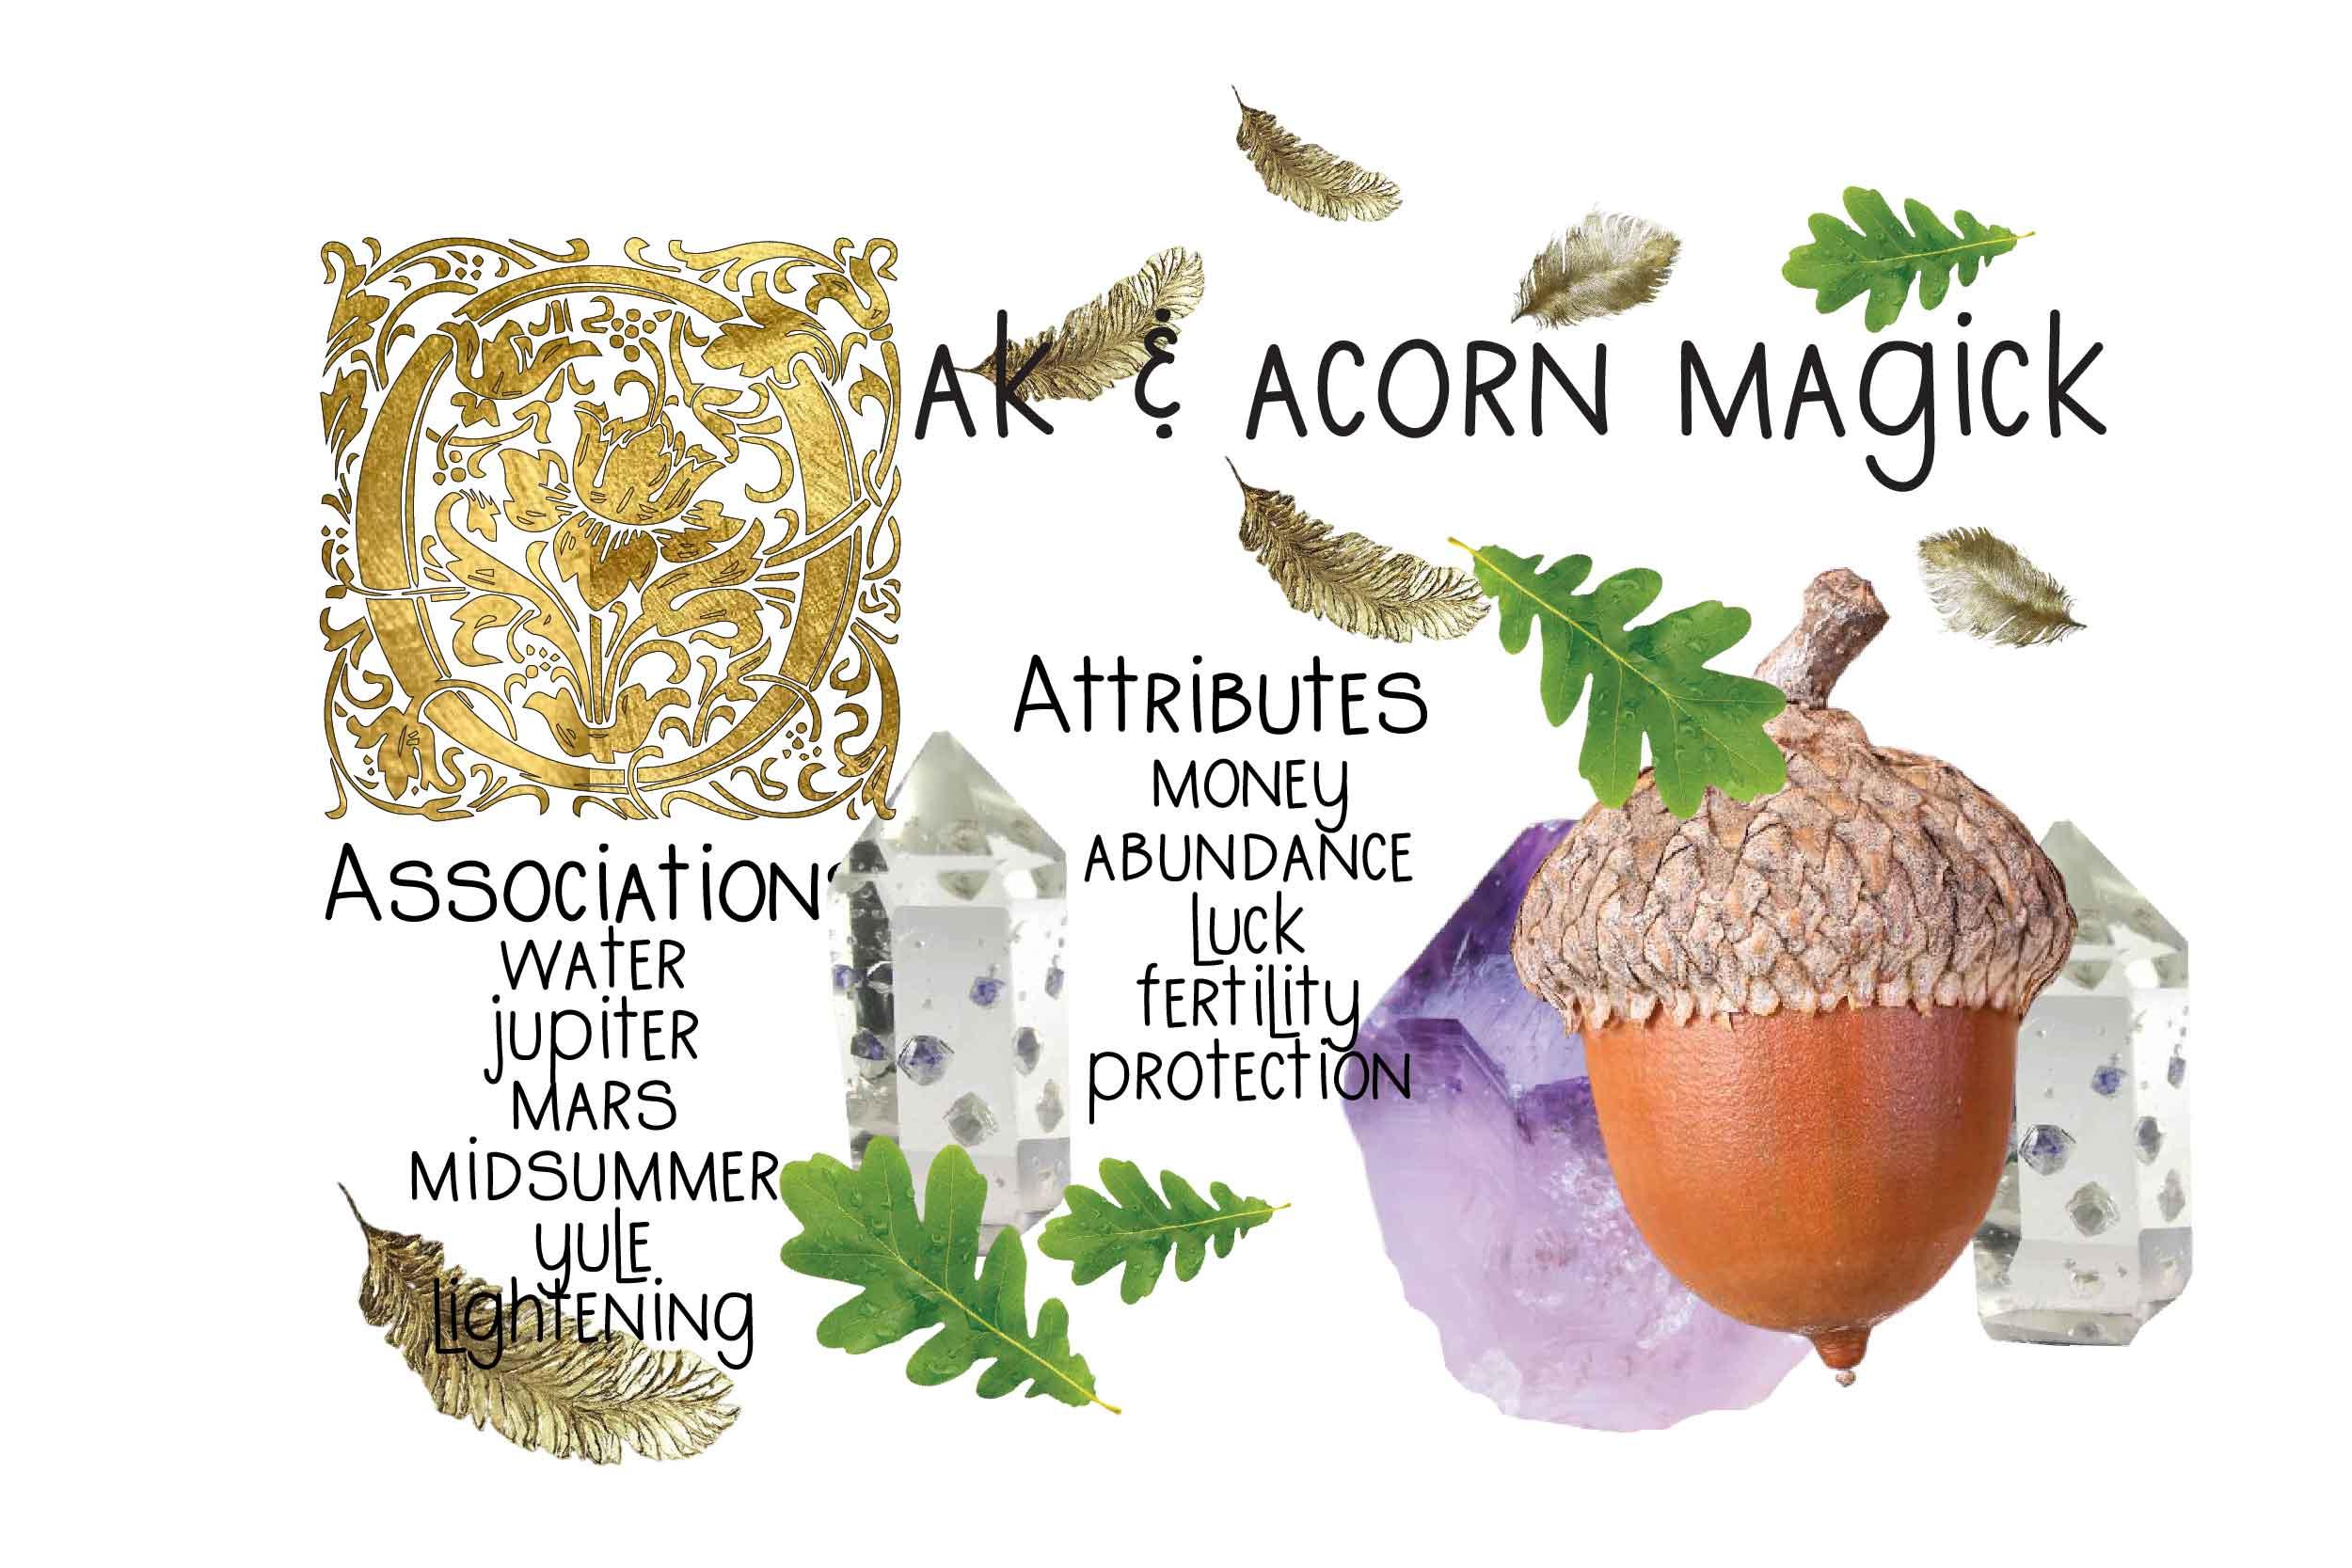 oak and acorn feature image